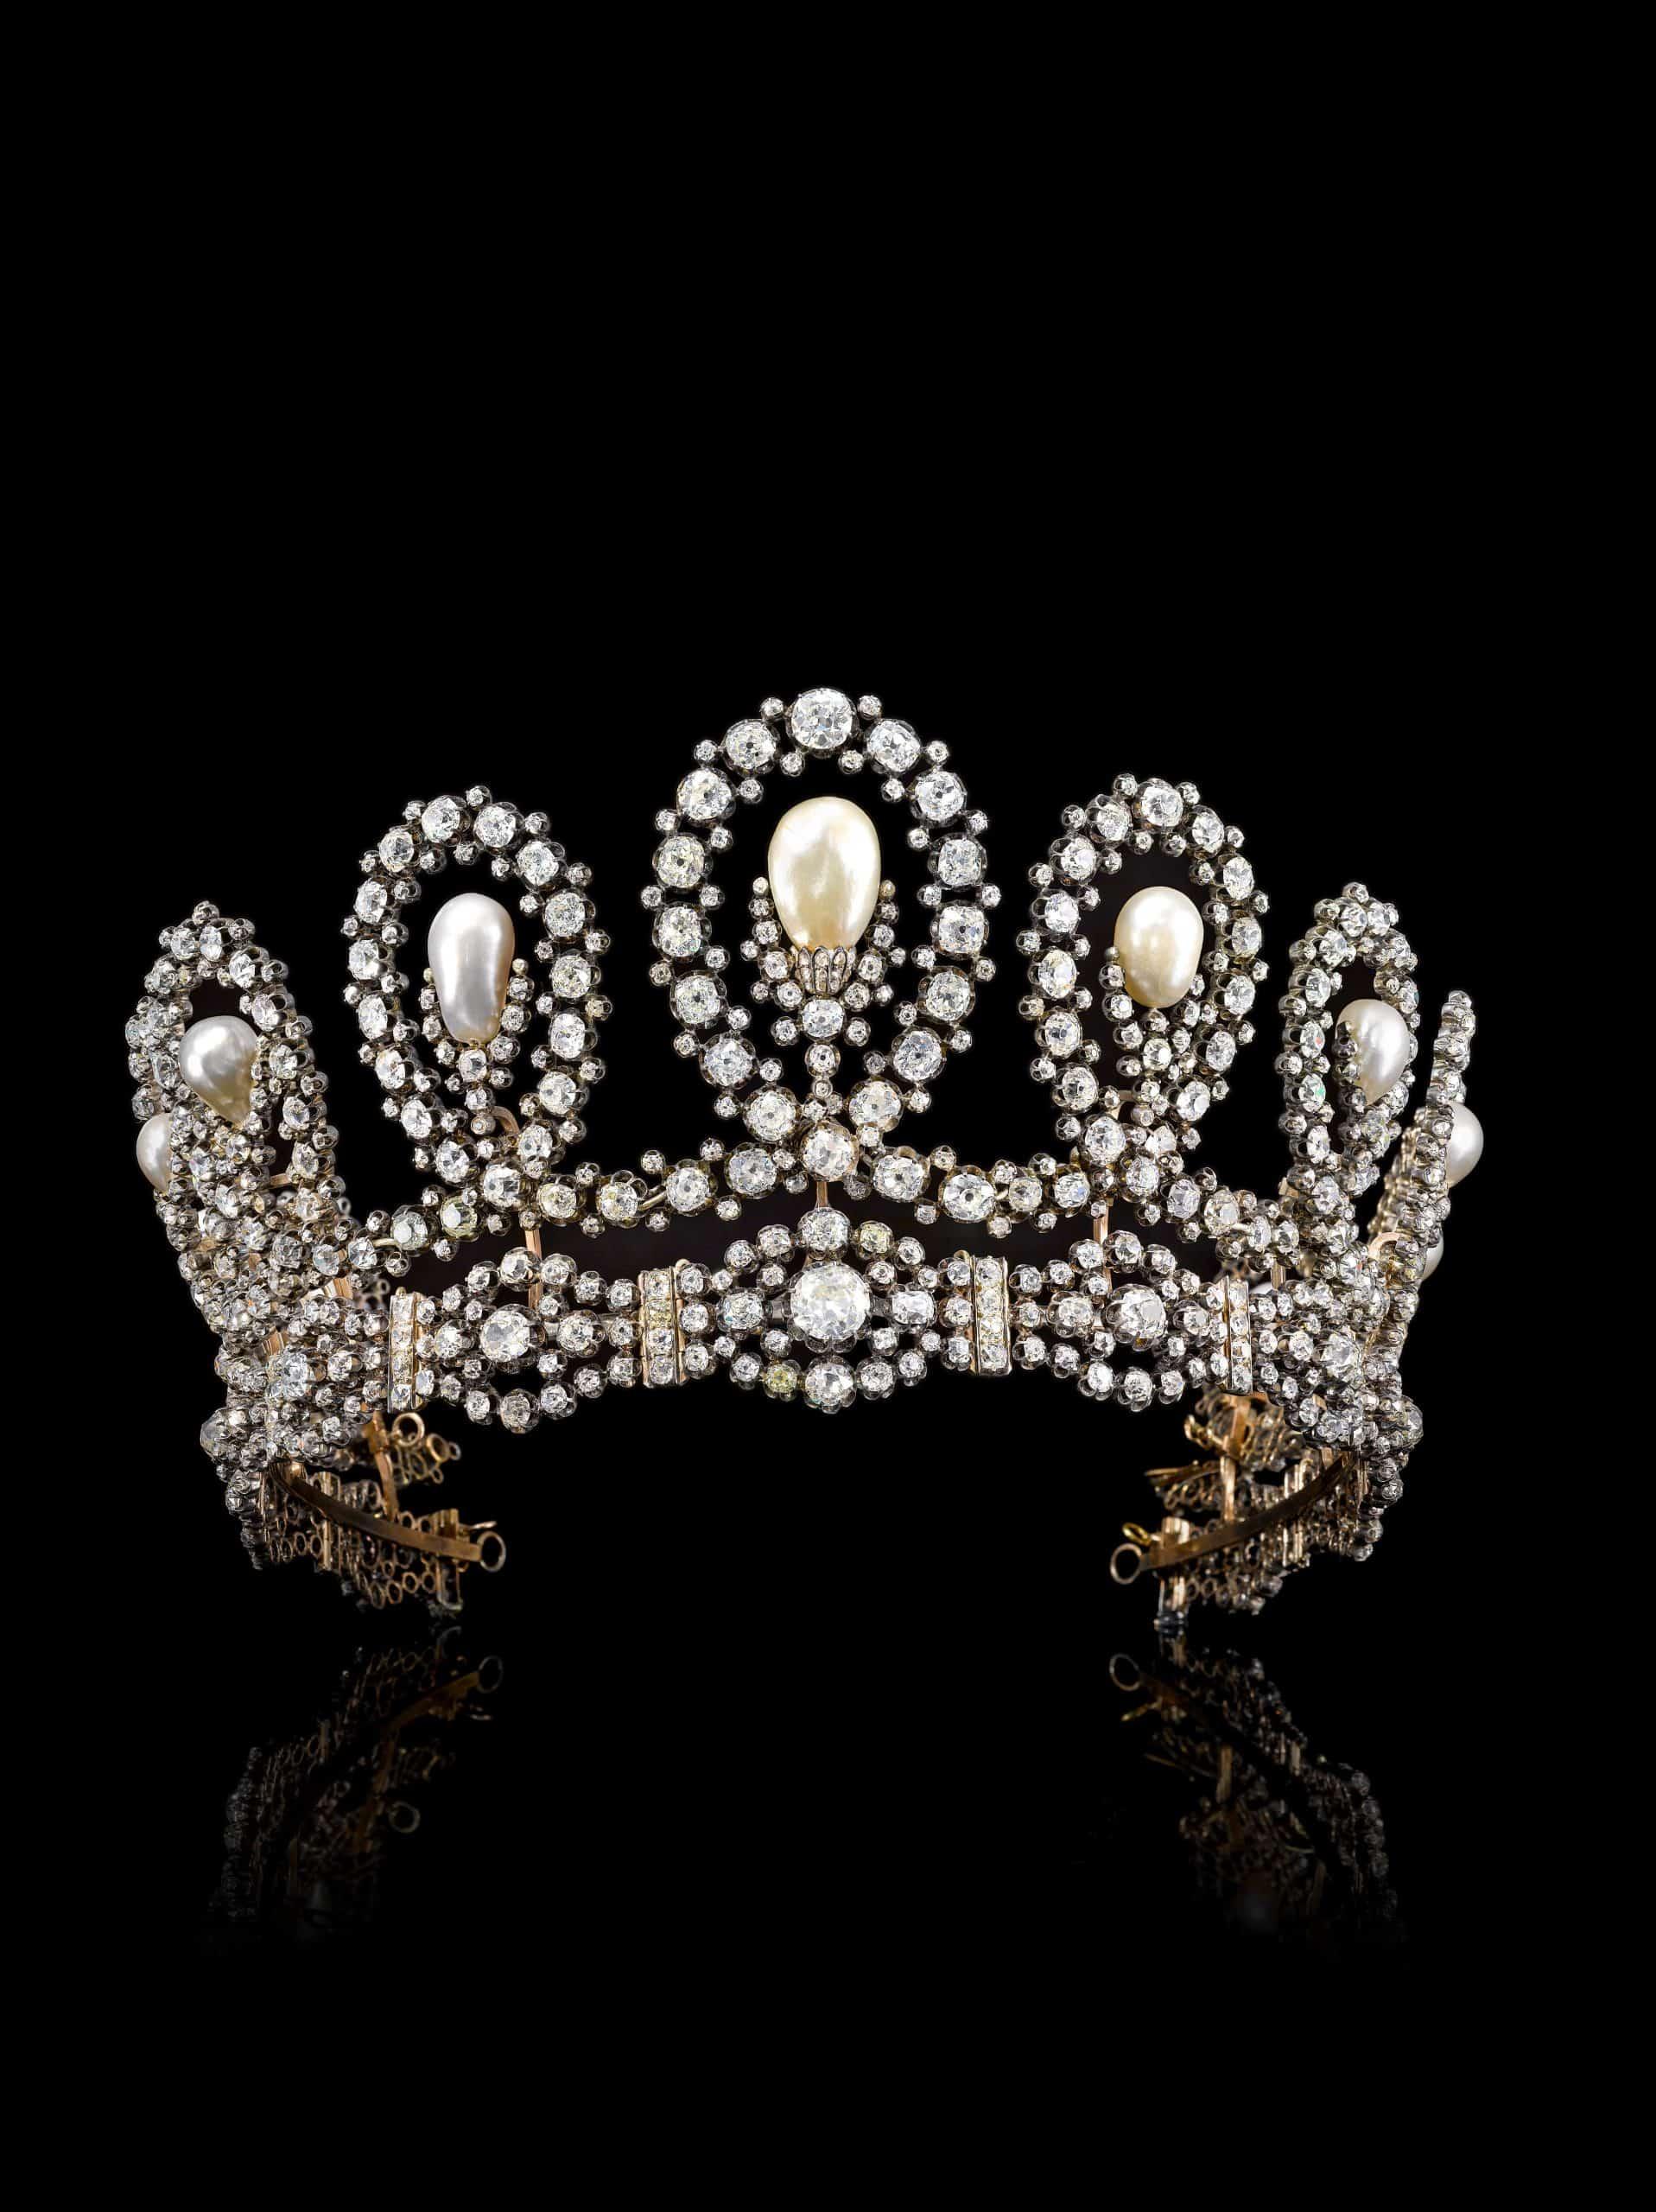 Royal Tiara in natural pearl and diamonds - Sotheby's Geneva